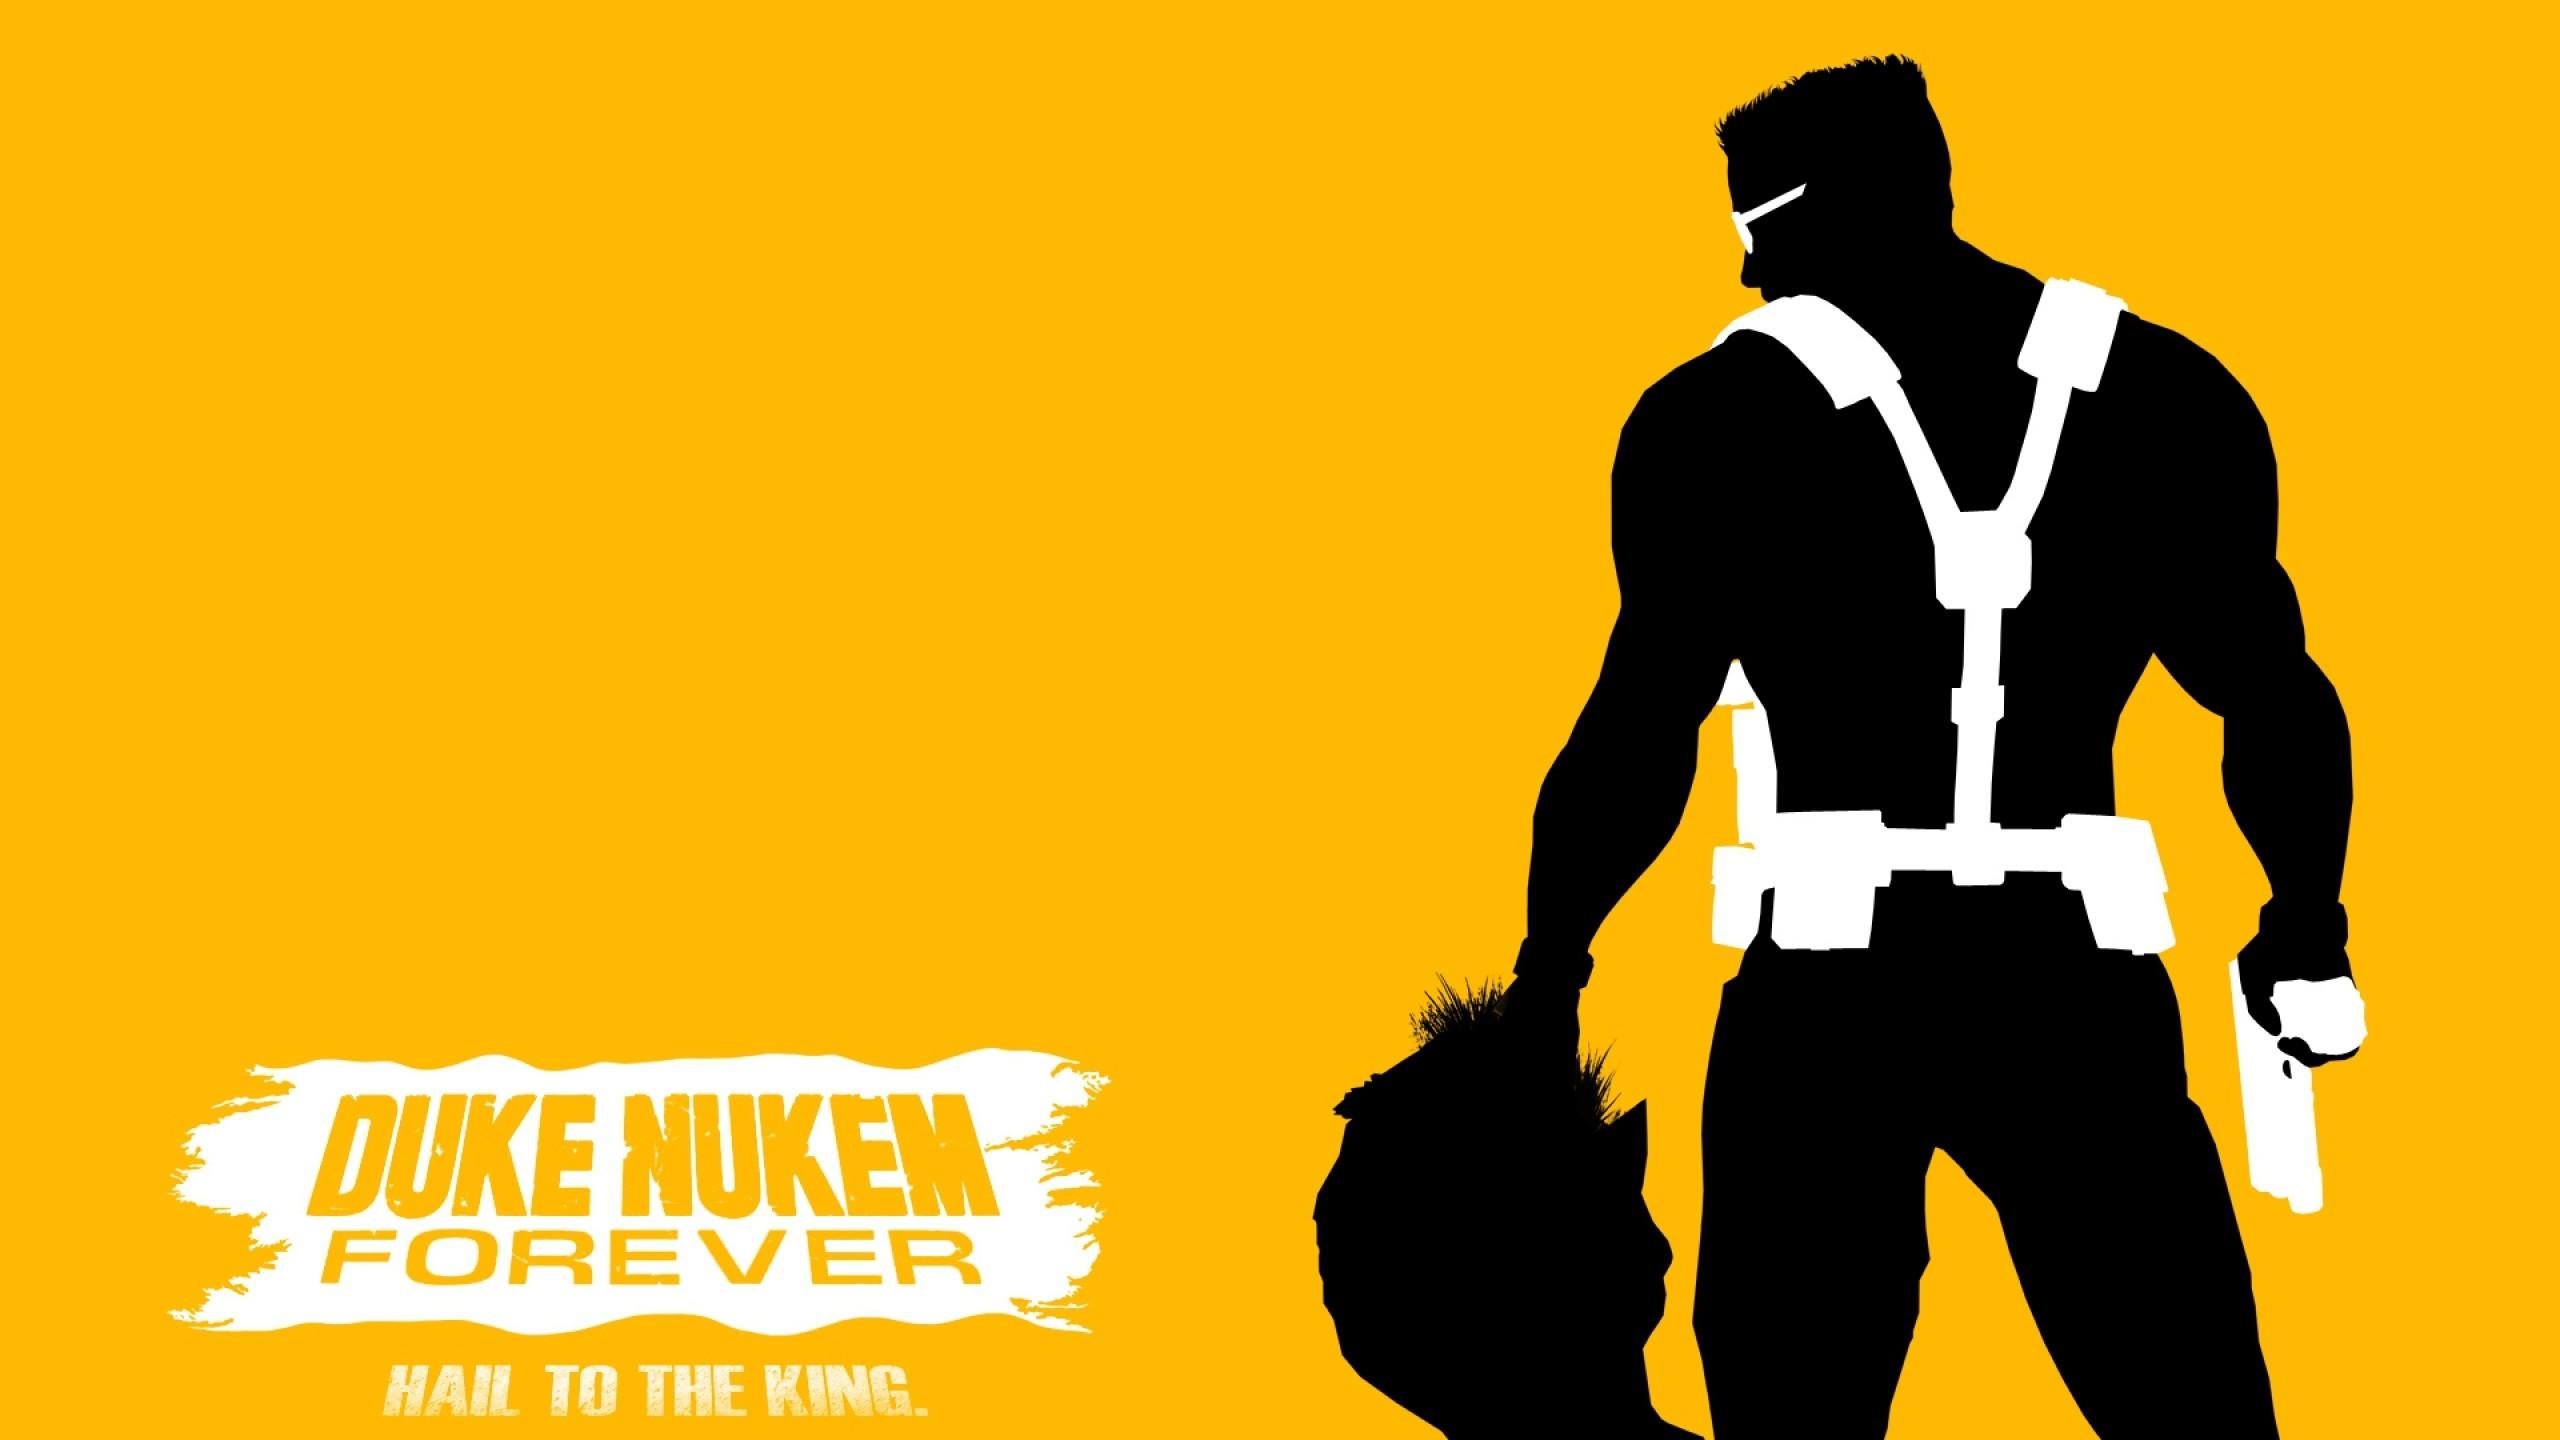 HD-Duke-Image